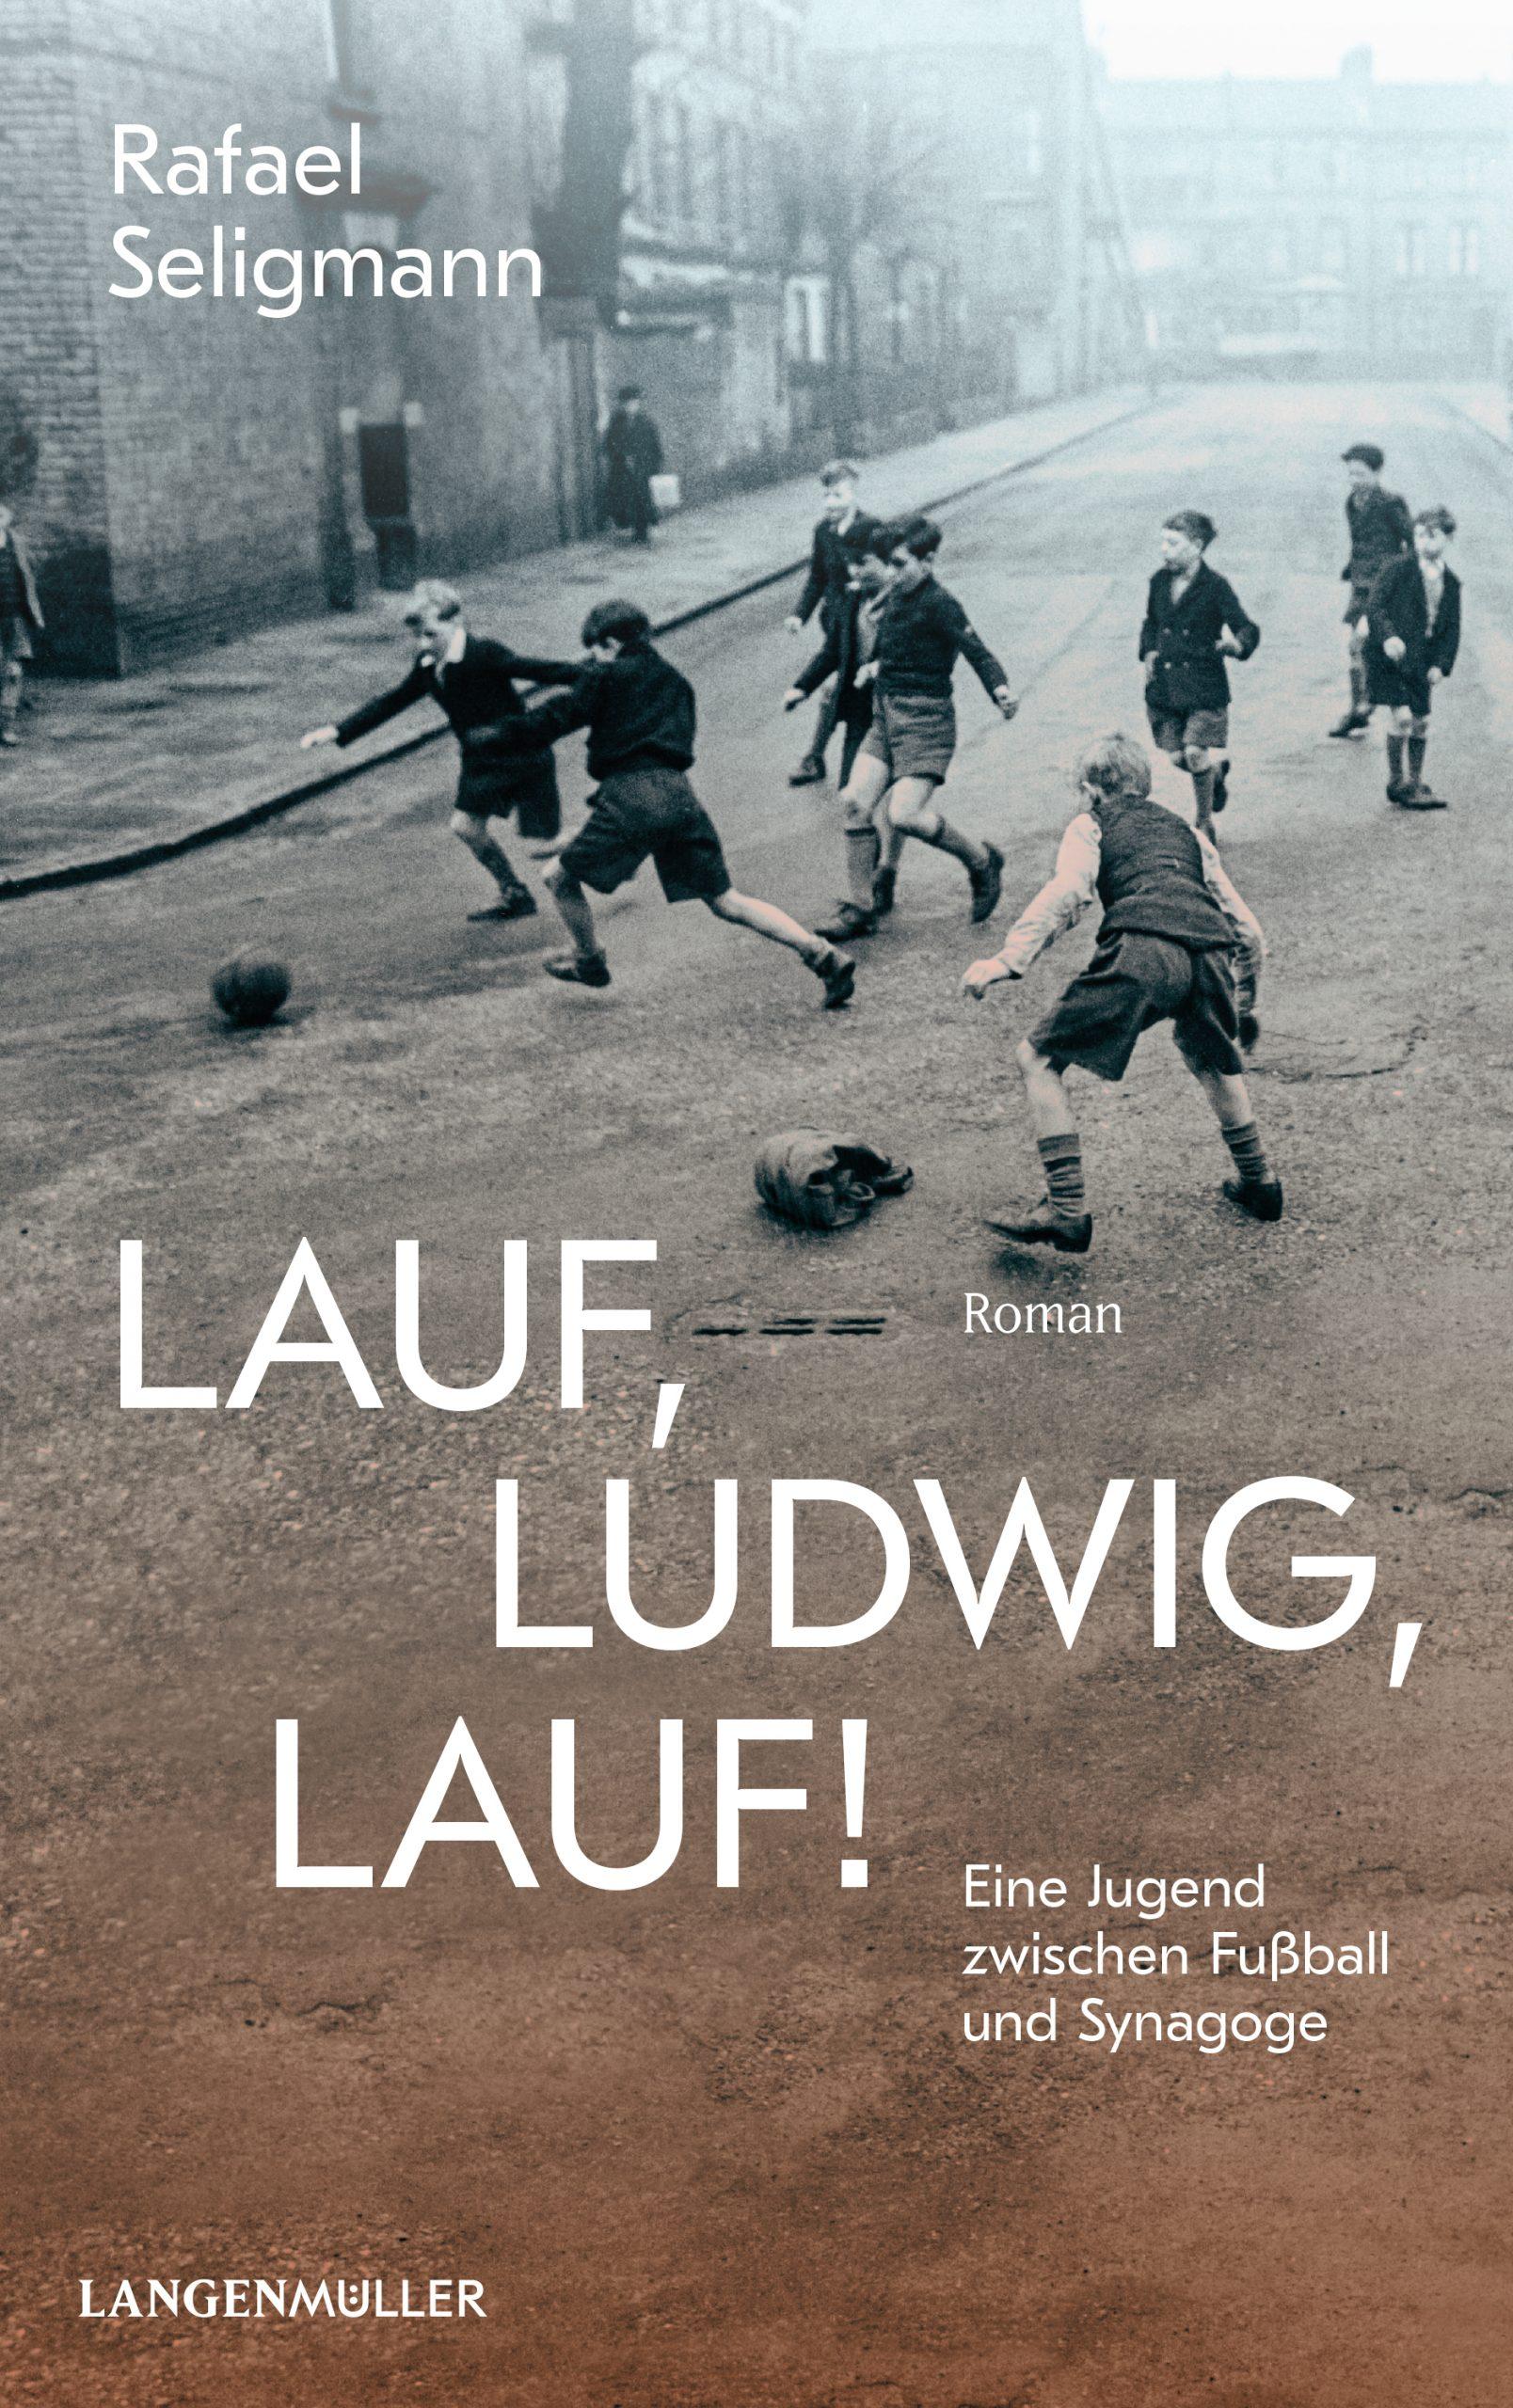 Lauf, Ludwig, lauf! von Rafael Seligmann Parkbuchhandlung Buchhandlung Bonn Bad Godesberg